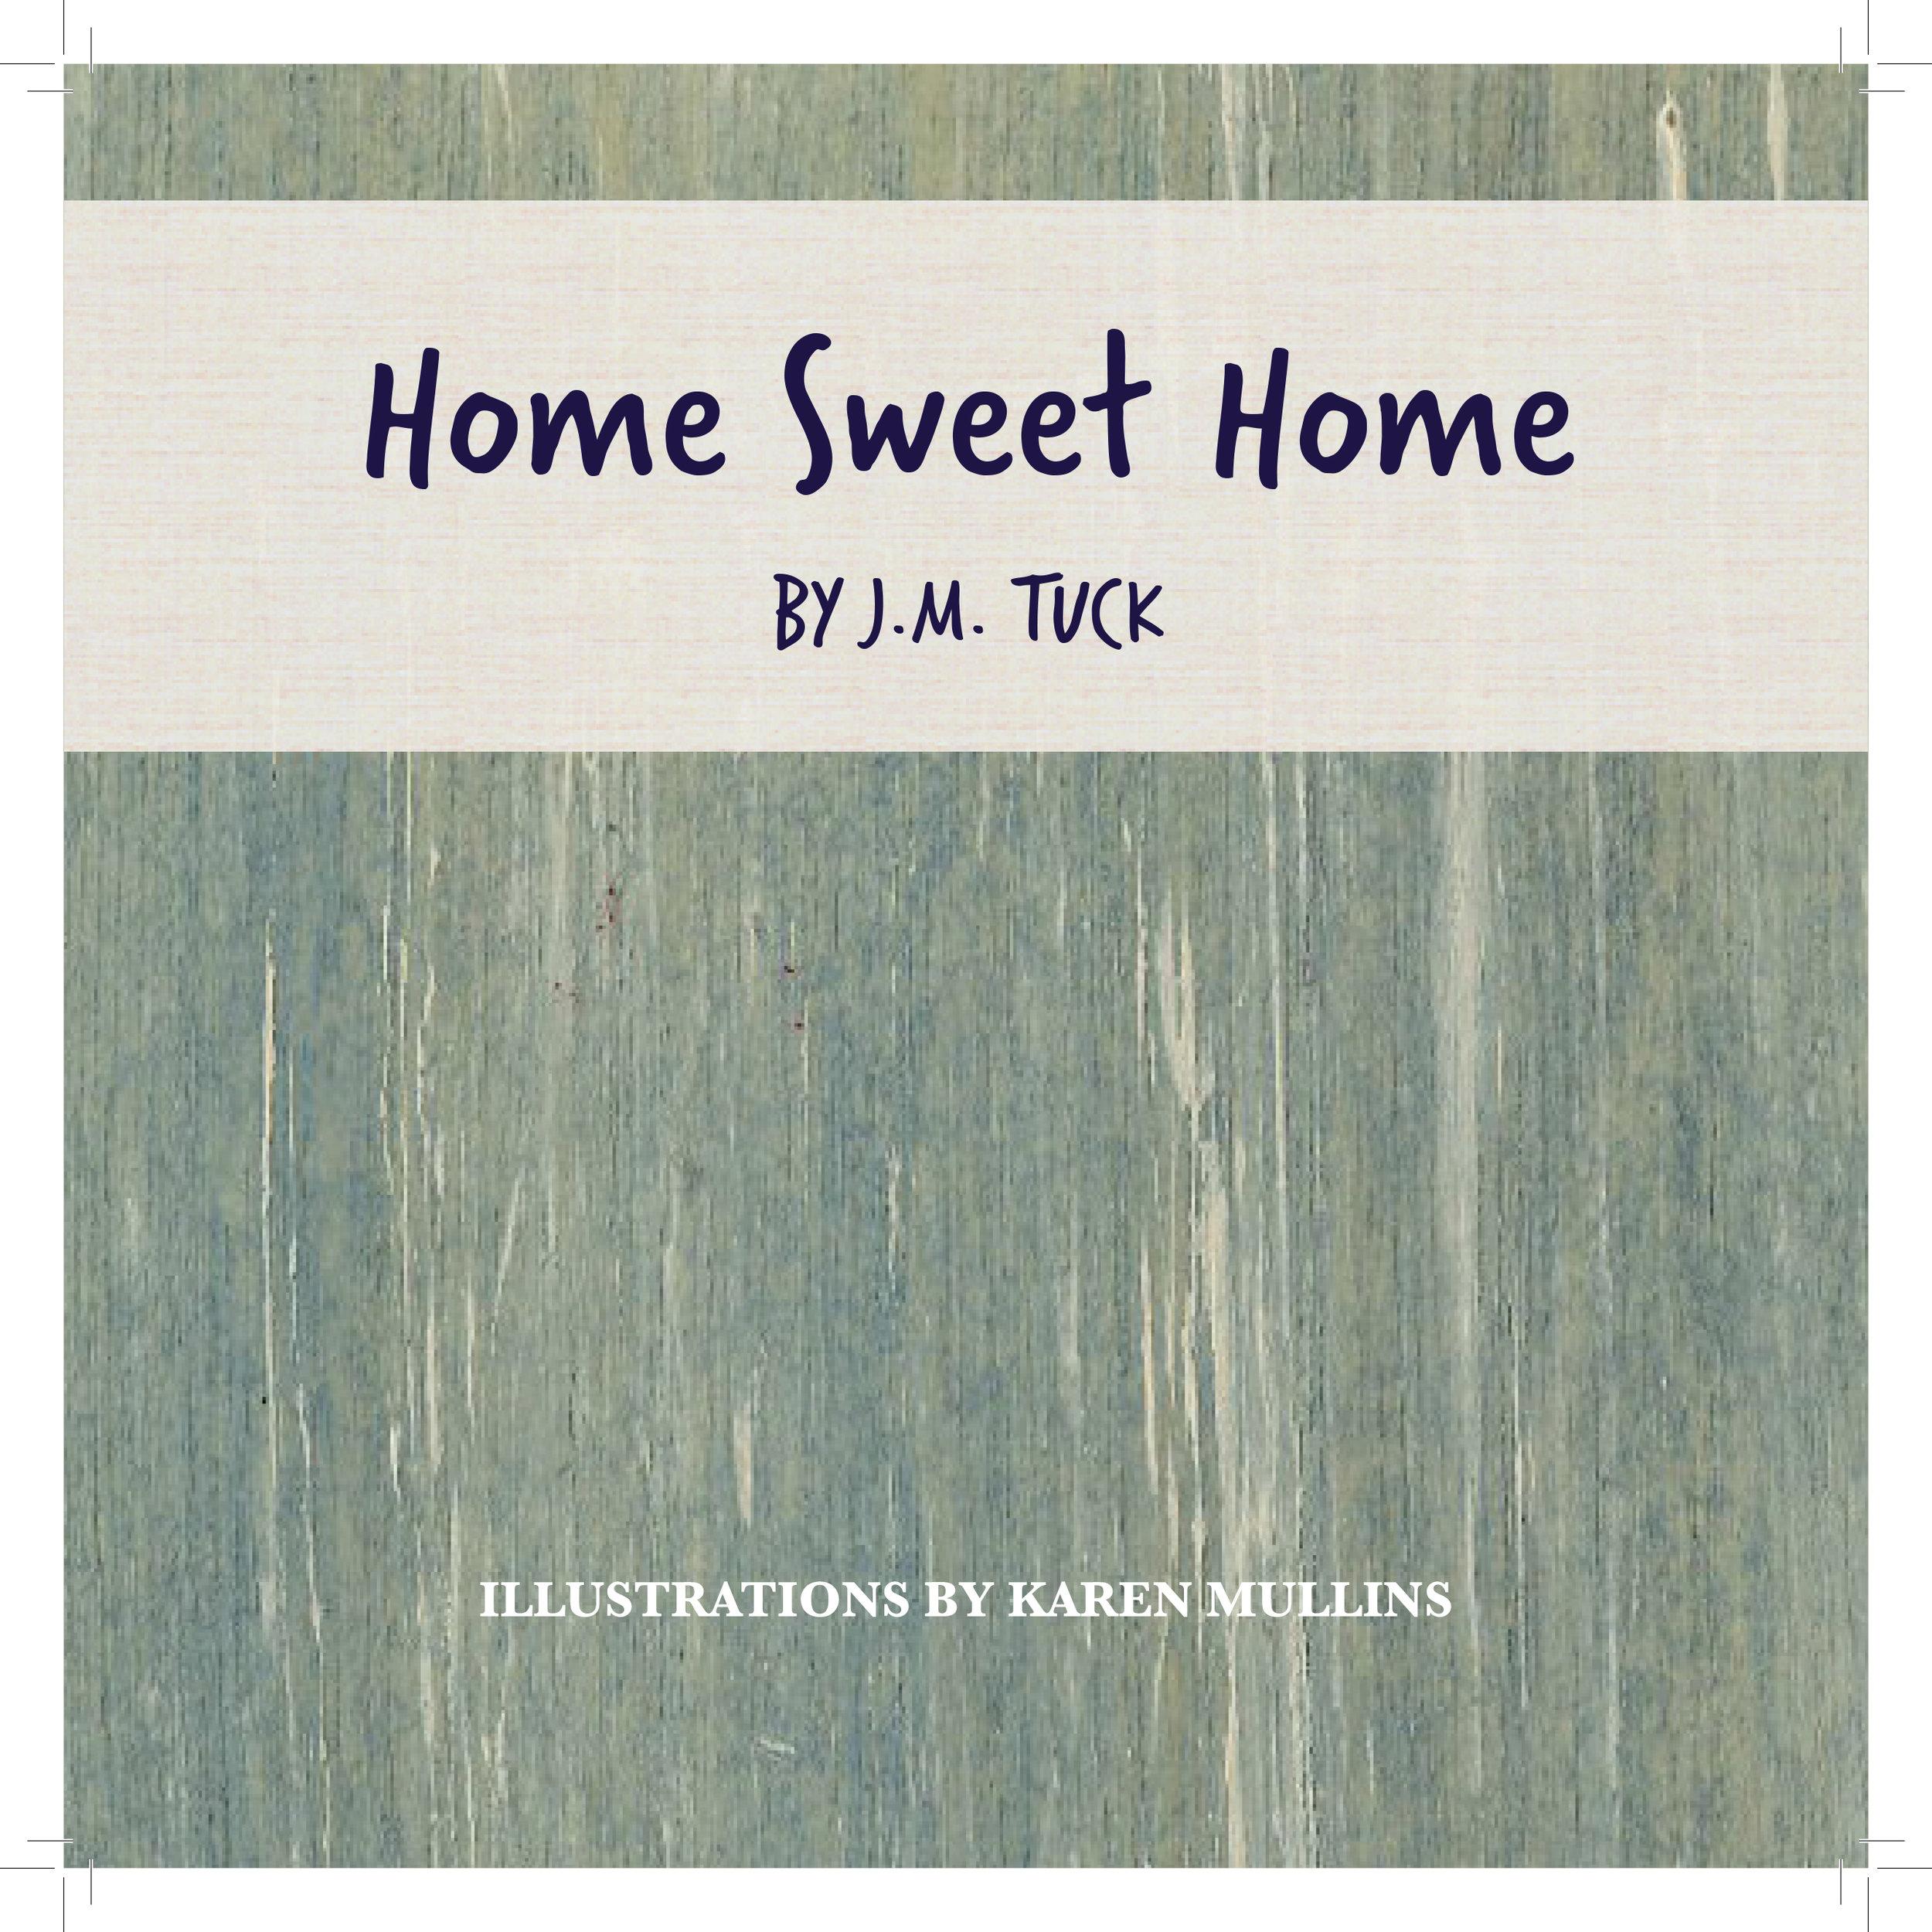 Home Sweet Home Cover.jpg